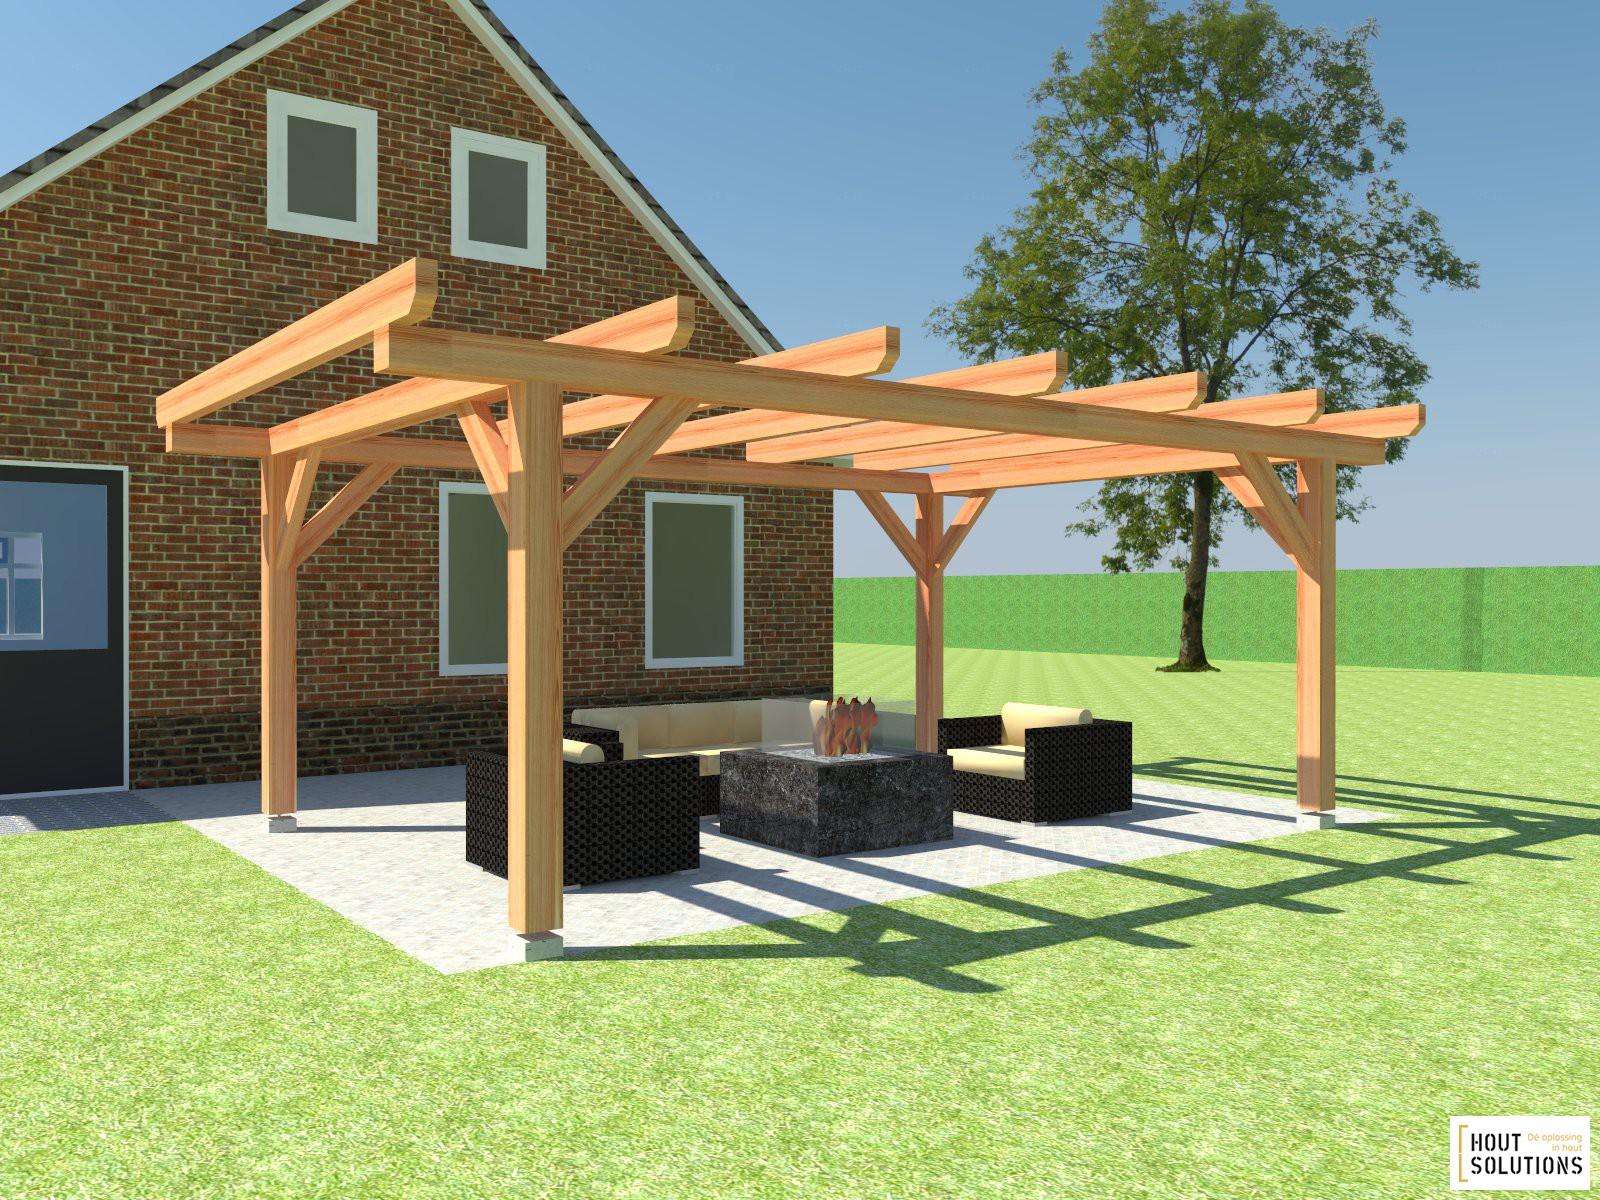 Pergola bouwen houtsolutions - Omslag van pergola ...